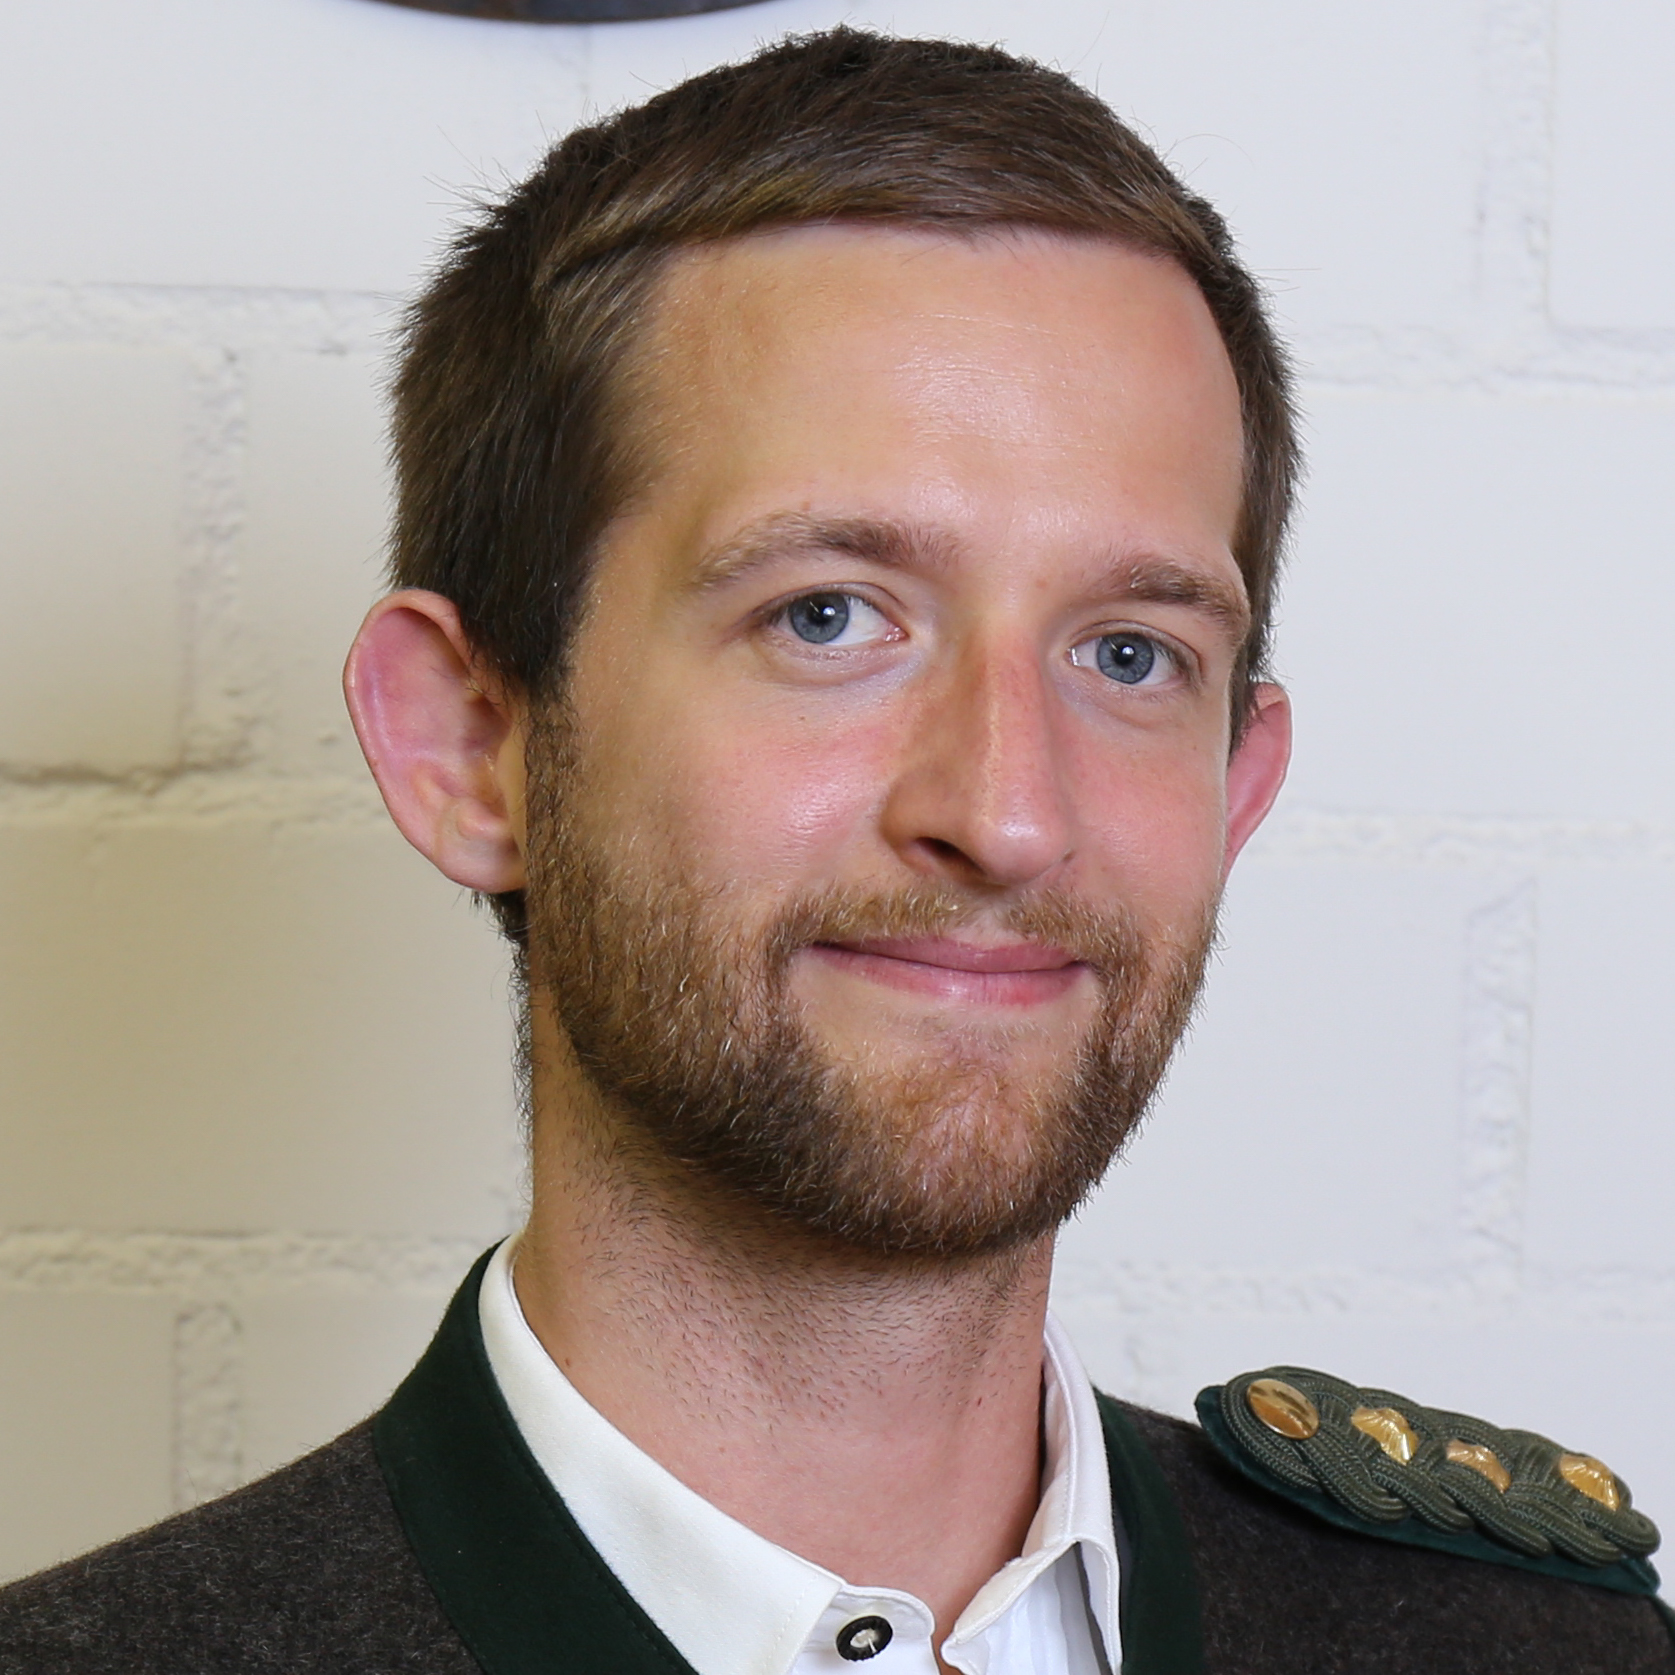 Kilian Unterholzner